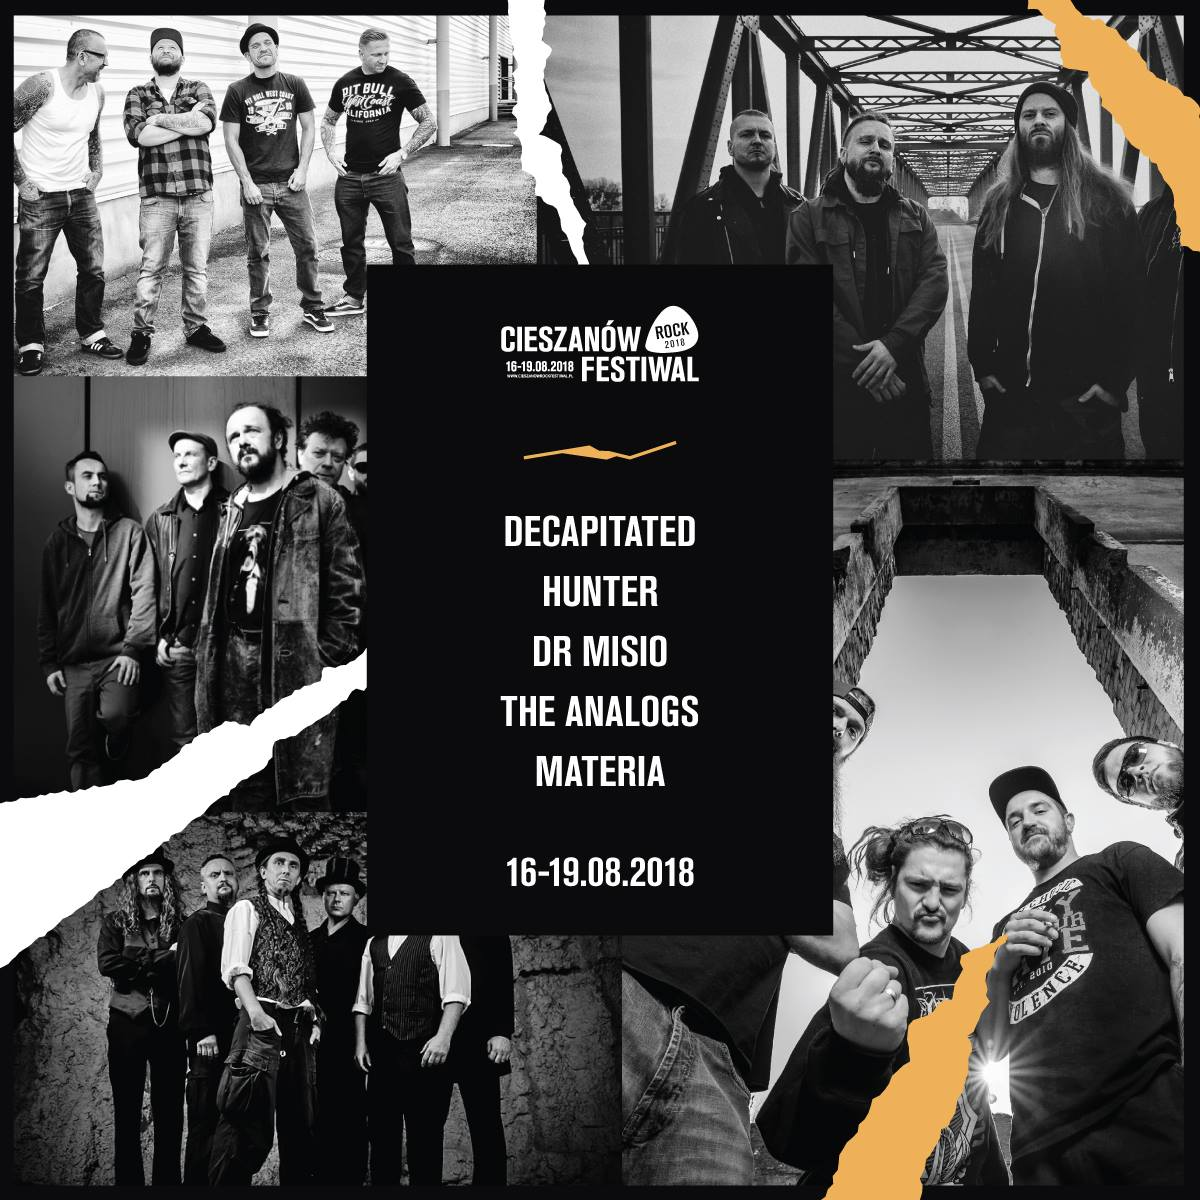 Cieszanów Rock Festiwal 2018 - line up.